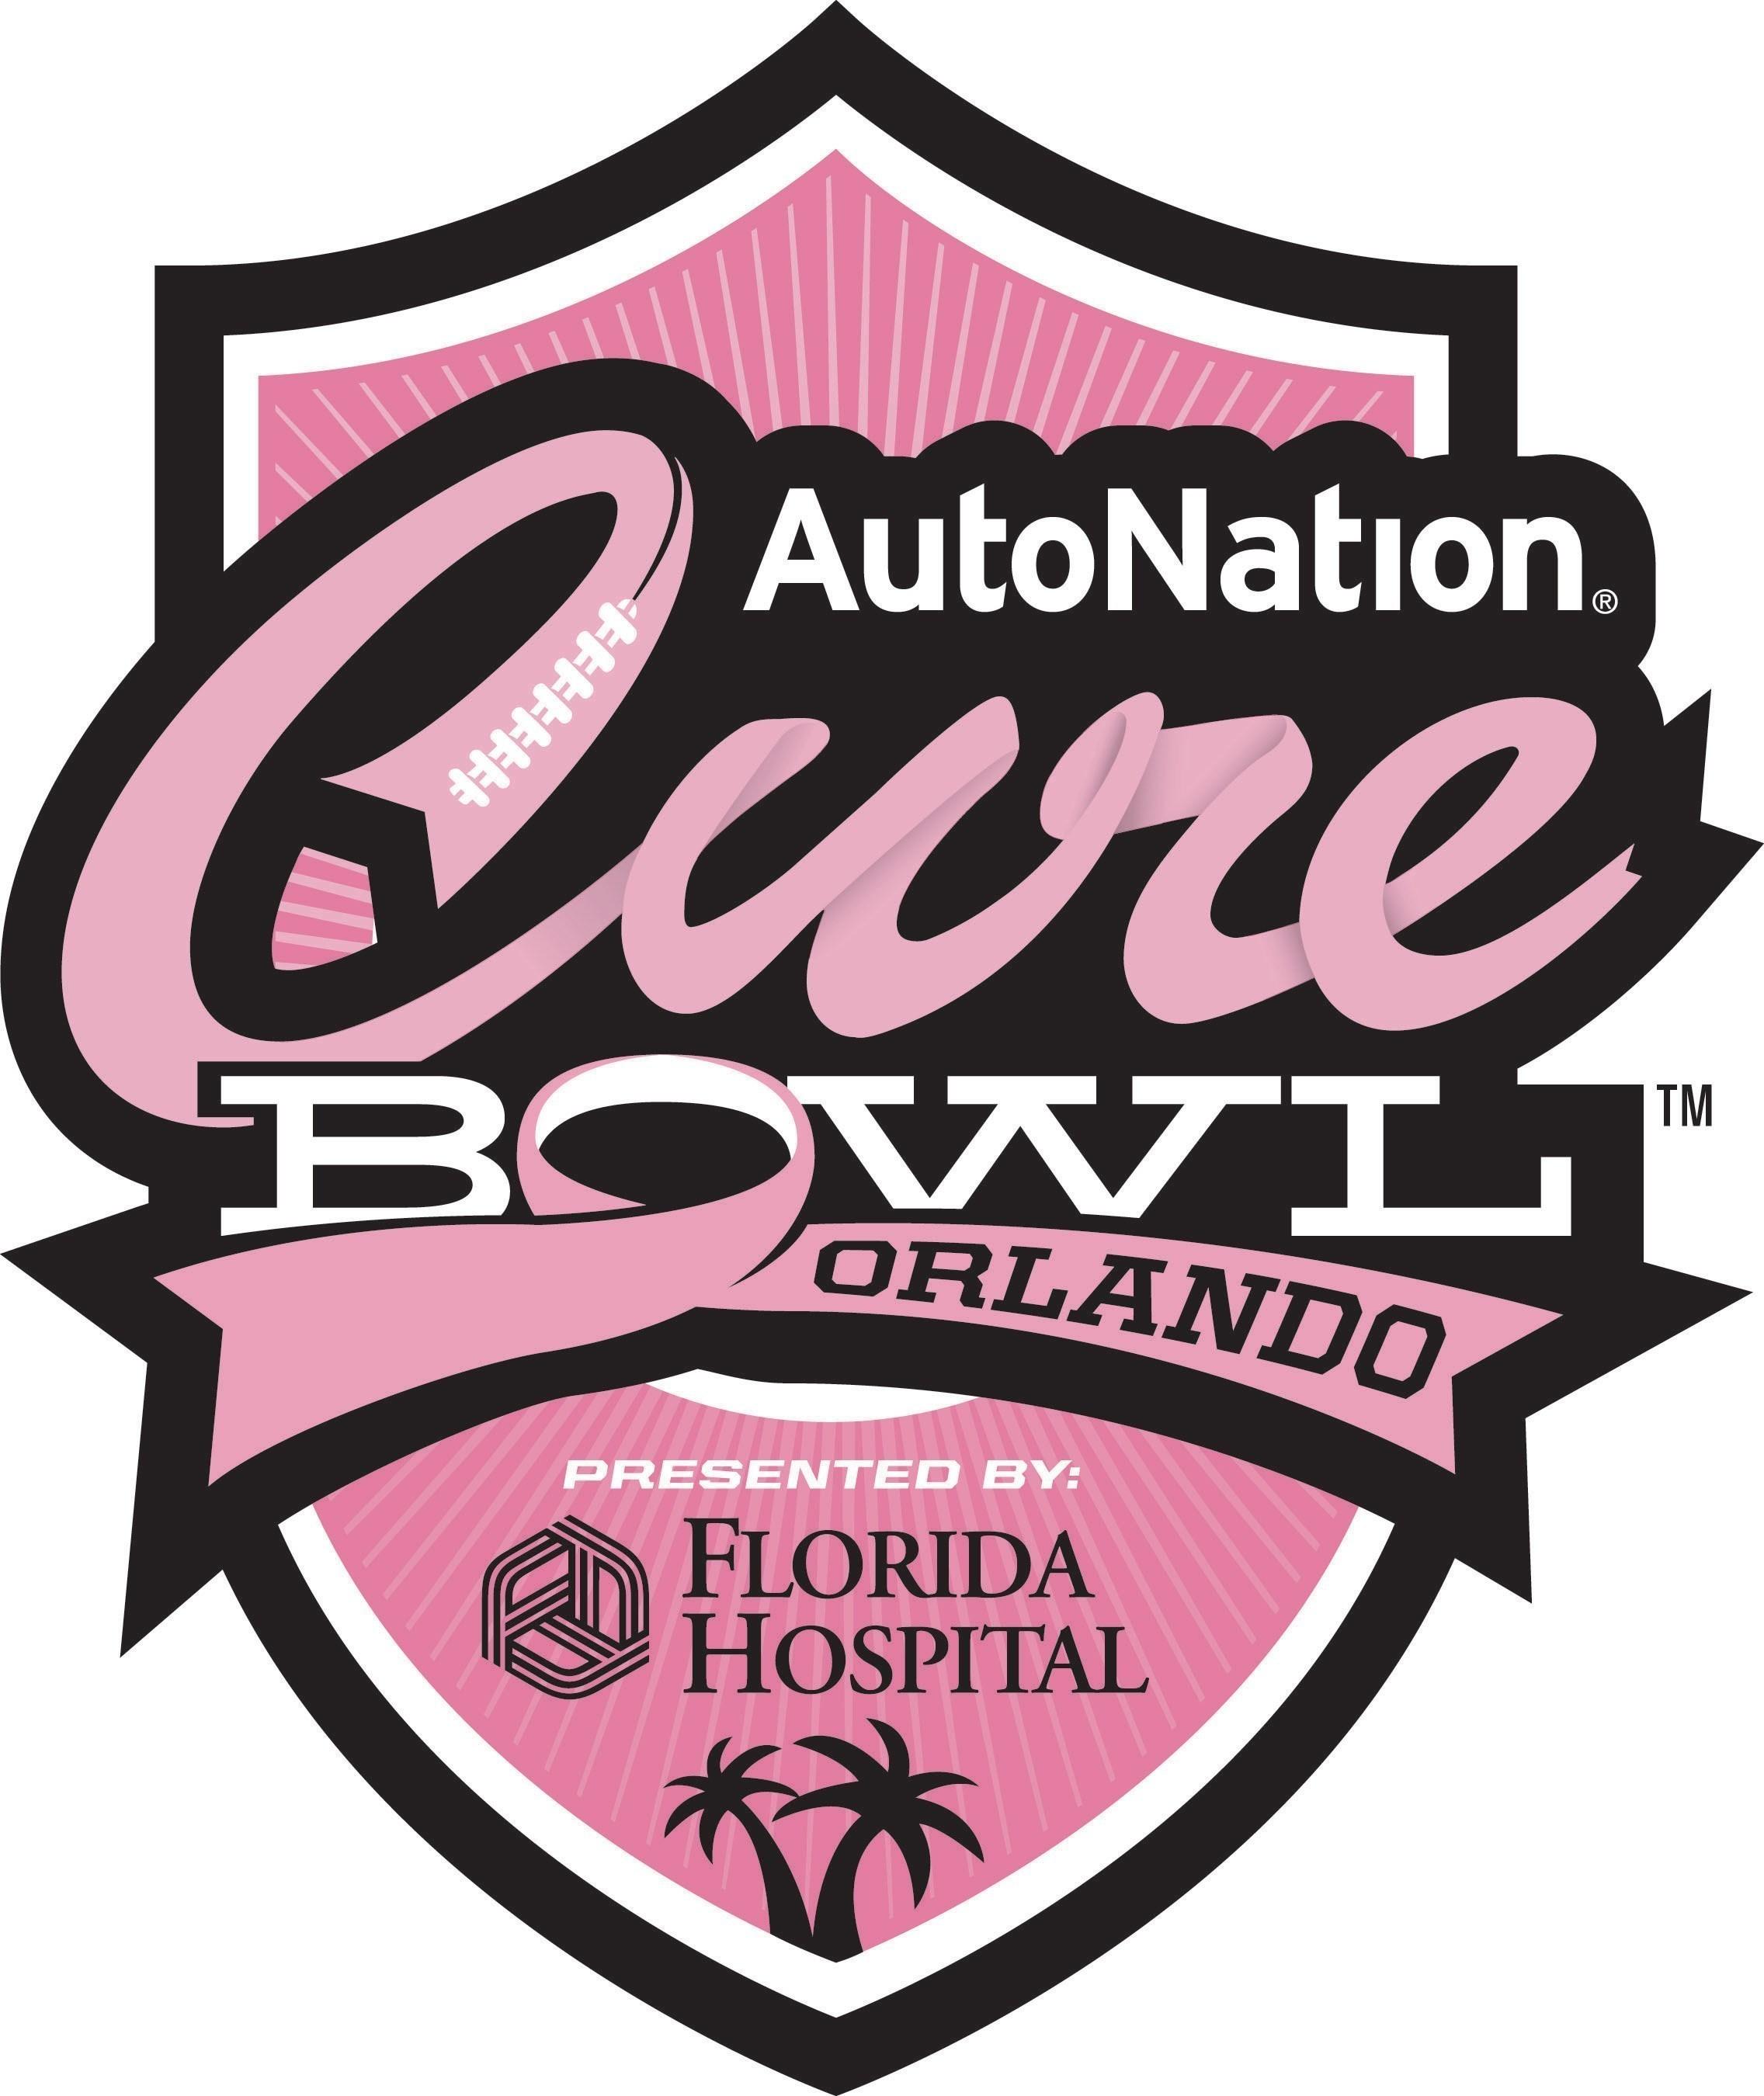 AutoNation Cure Bowl Orlando